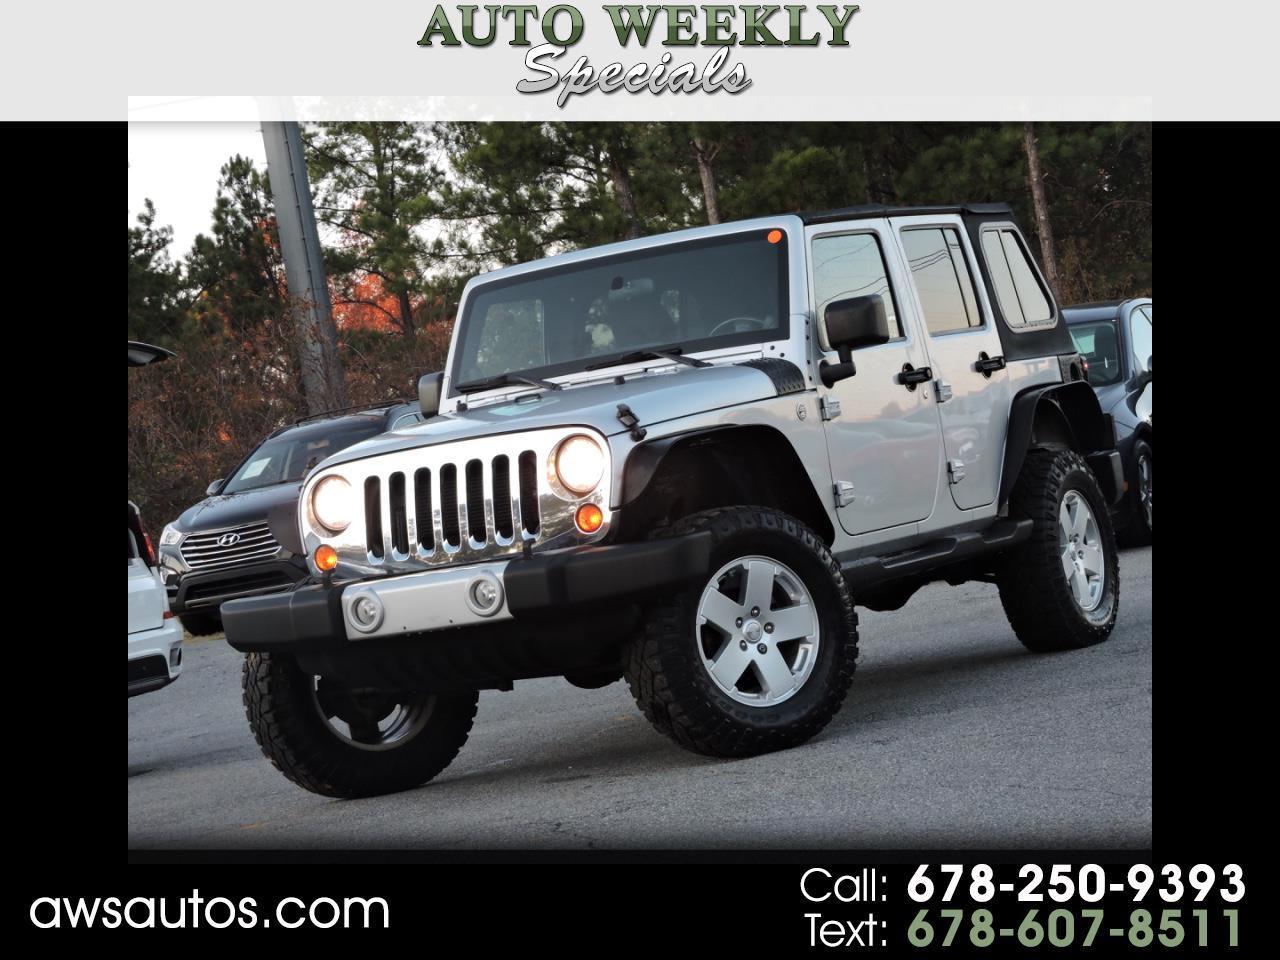 2012 Jeep Wrangler Unlimited 4WD 4dr Sahara